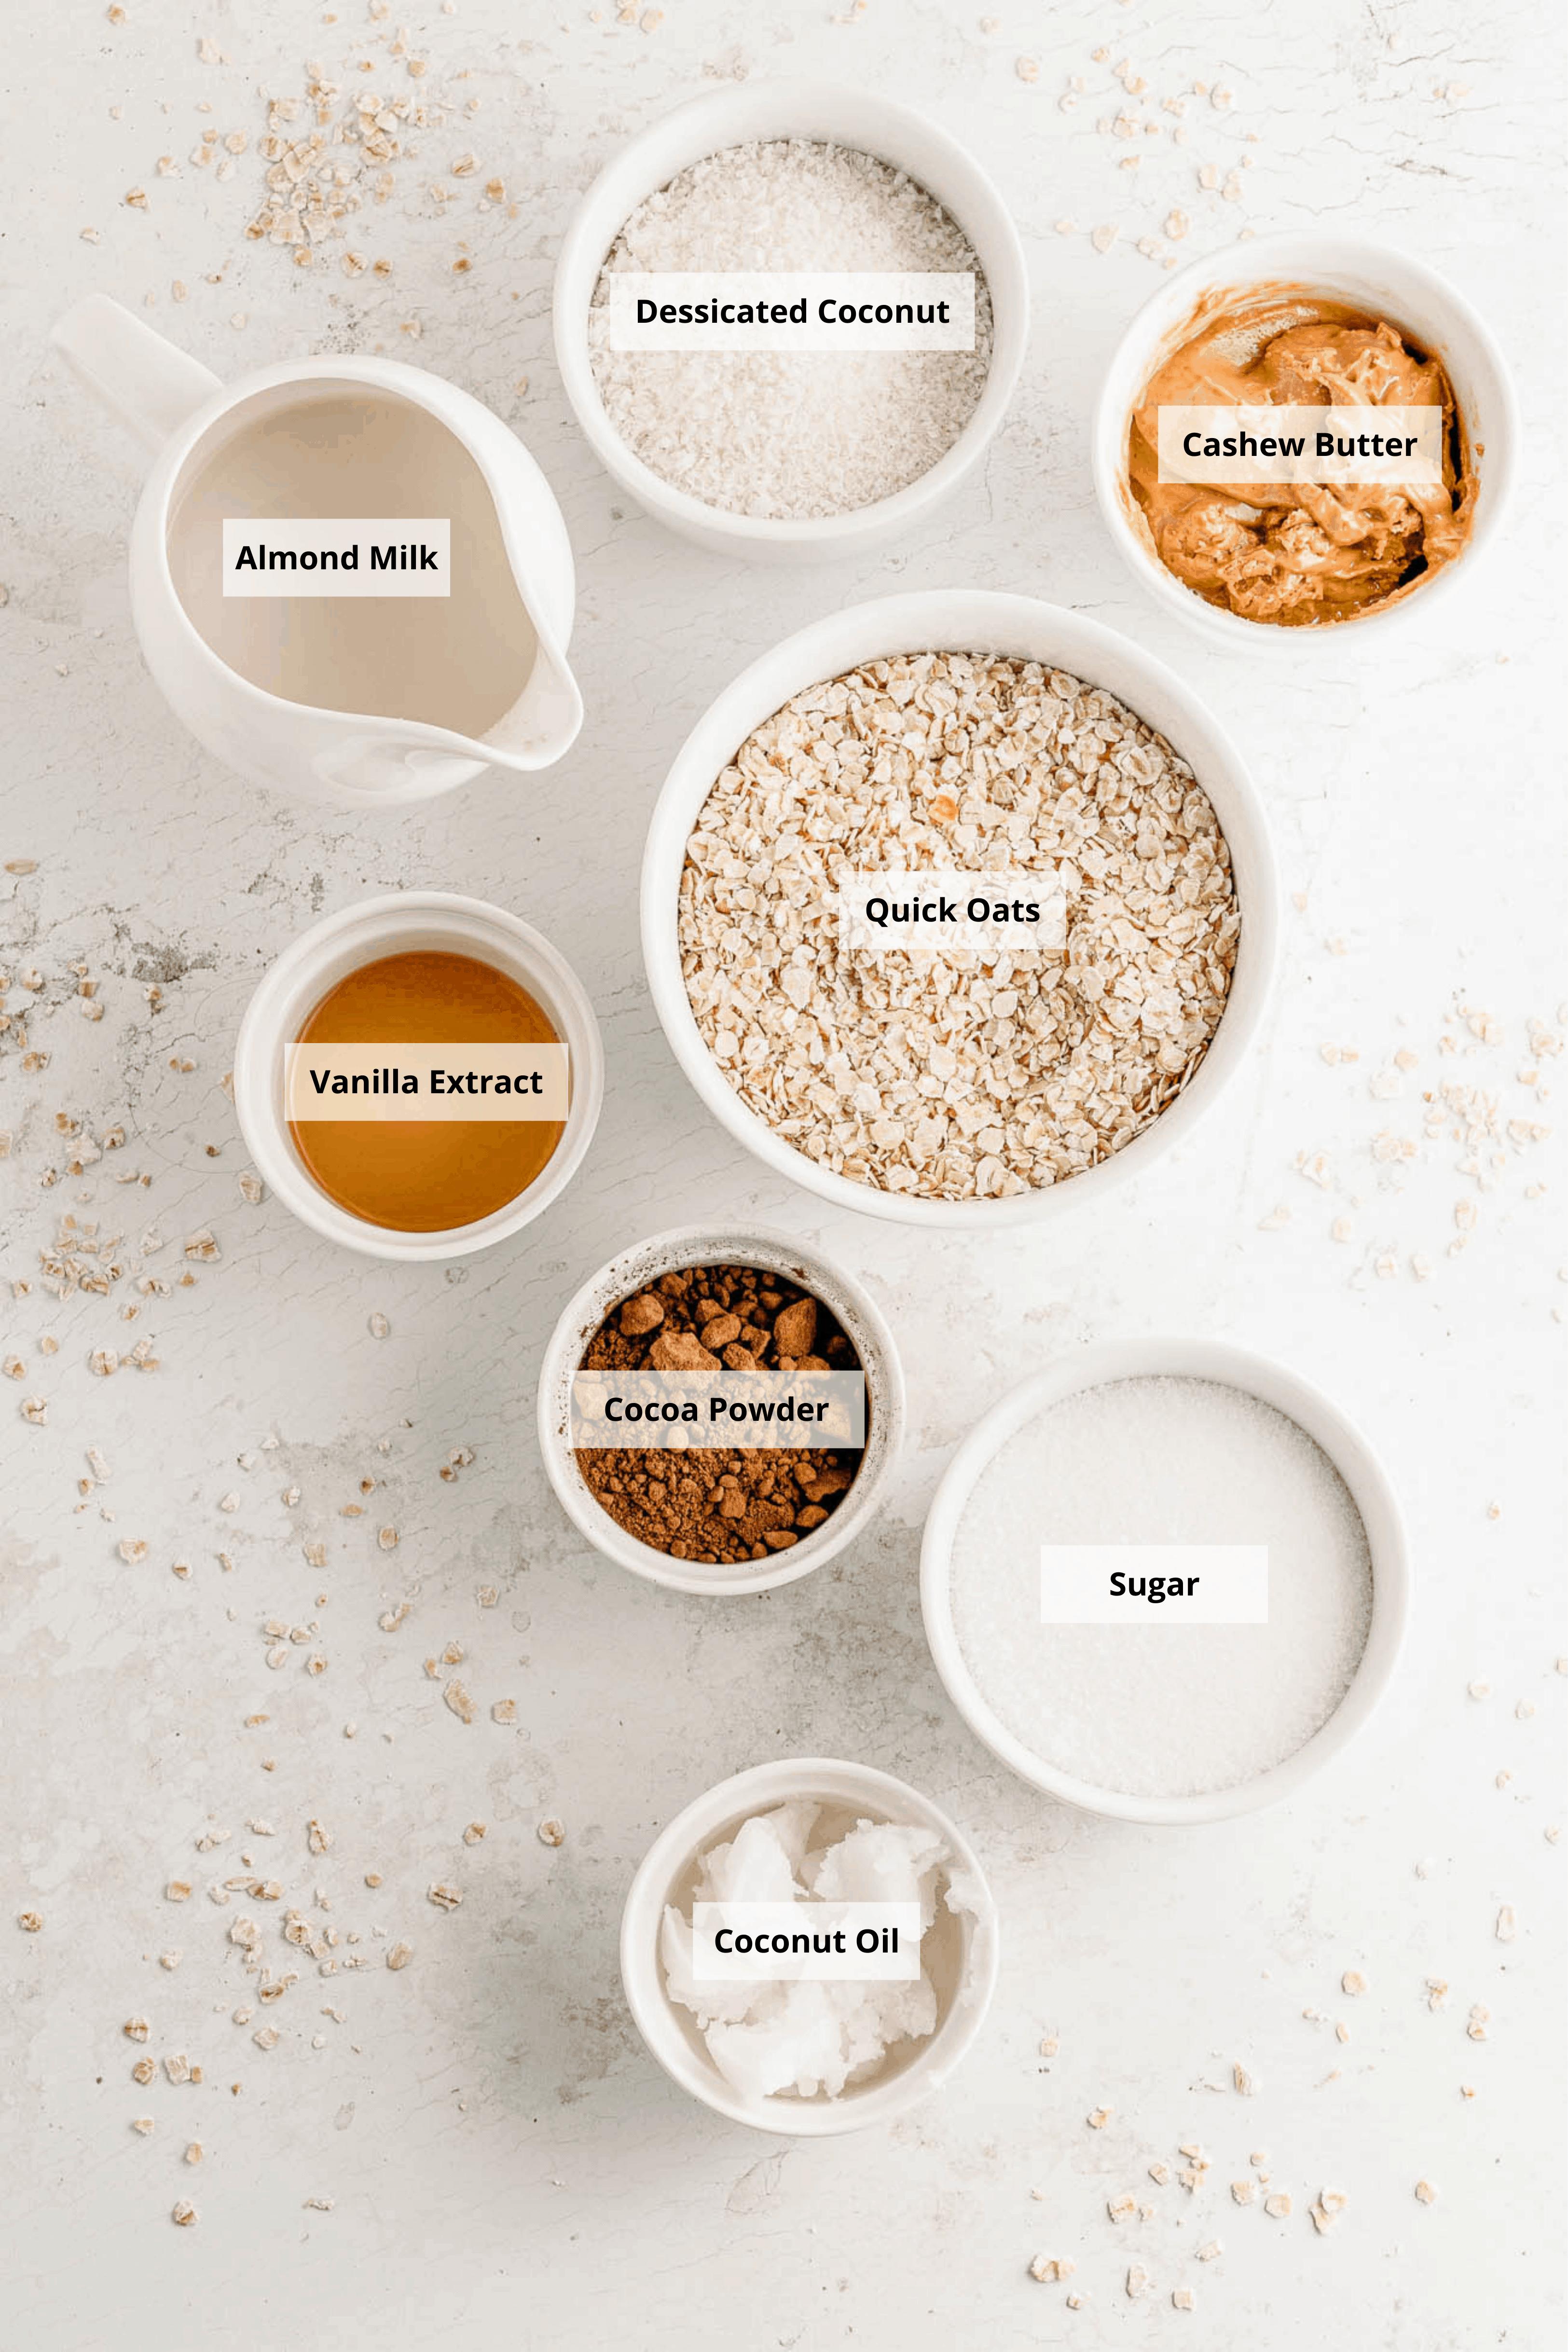 recipe ingredients - oats almond milk cocoa powder sugar coconut oil cashew butter